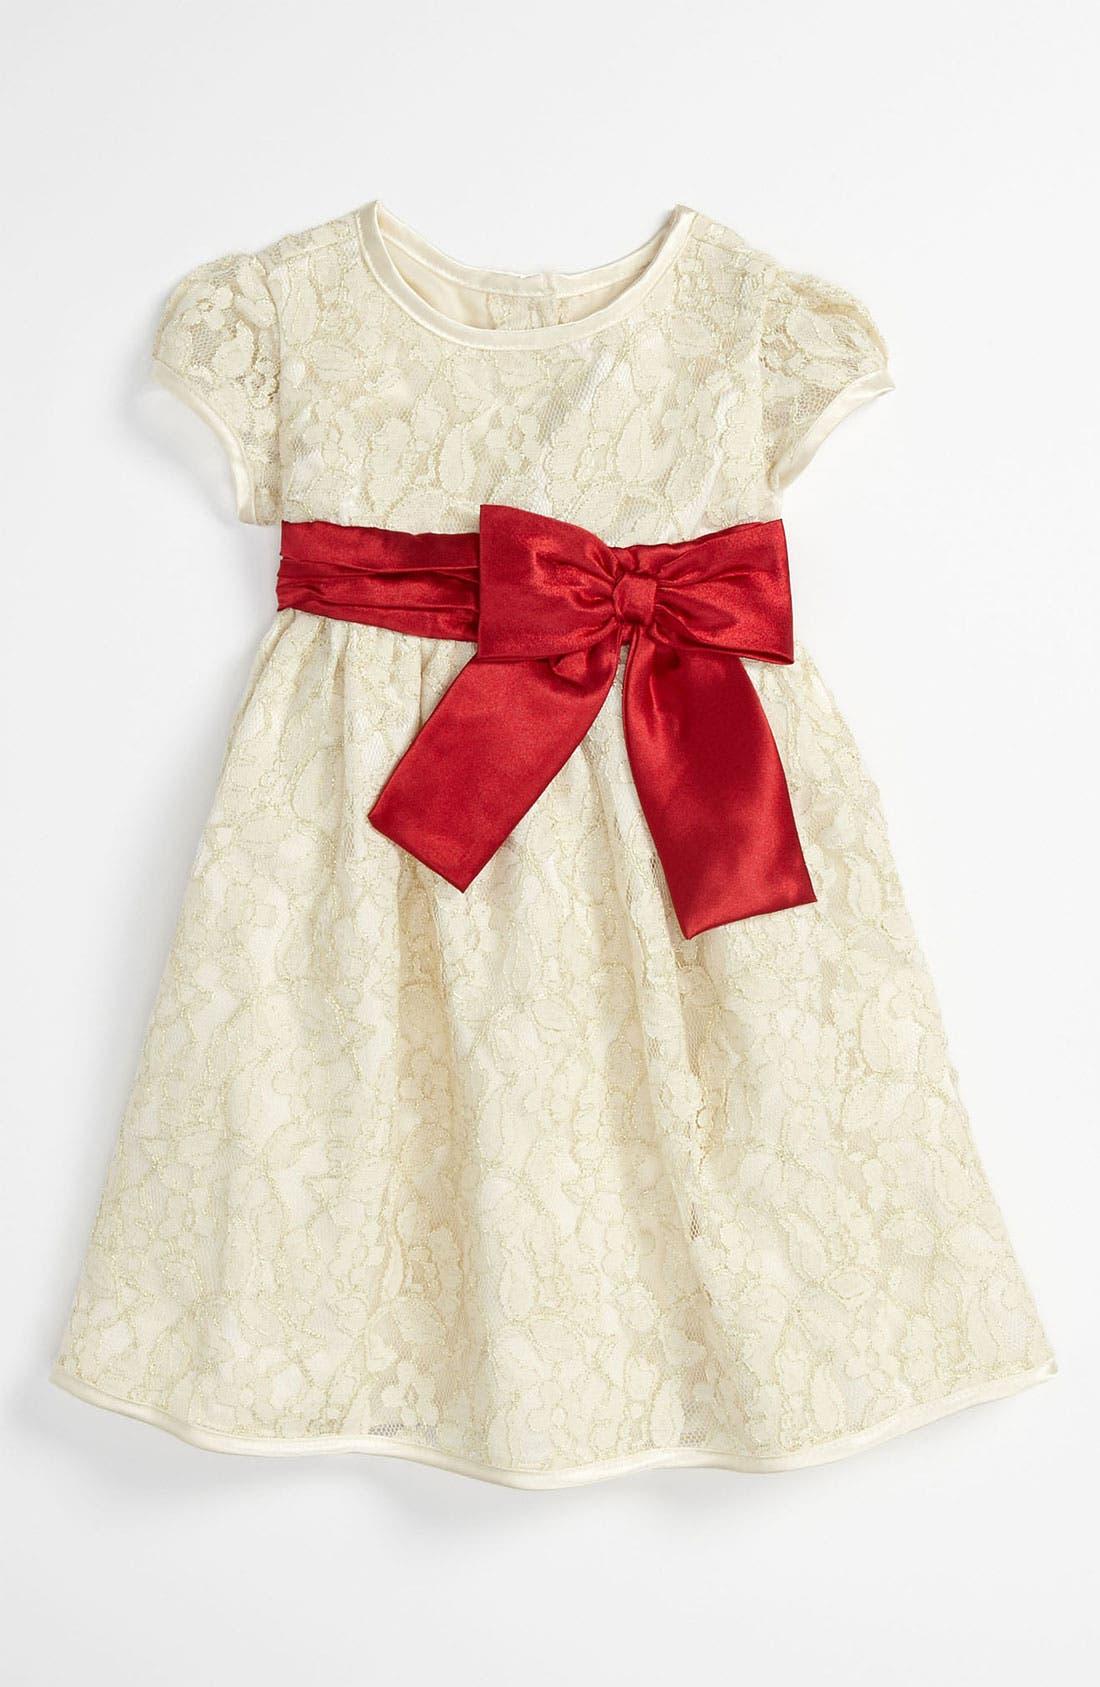 Alternate Image 1 Selected - Sweet Heart Rose Lace Dress (Toddler)